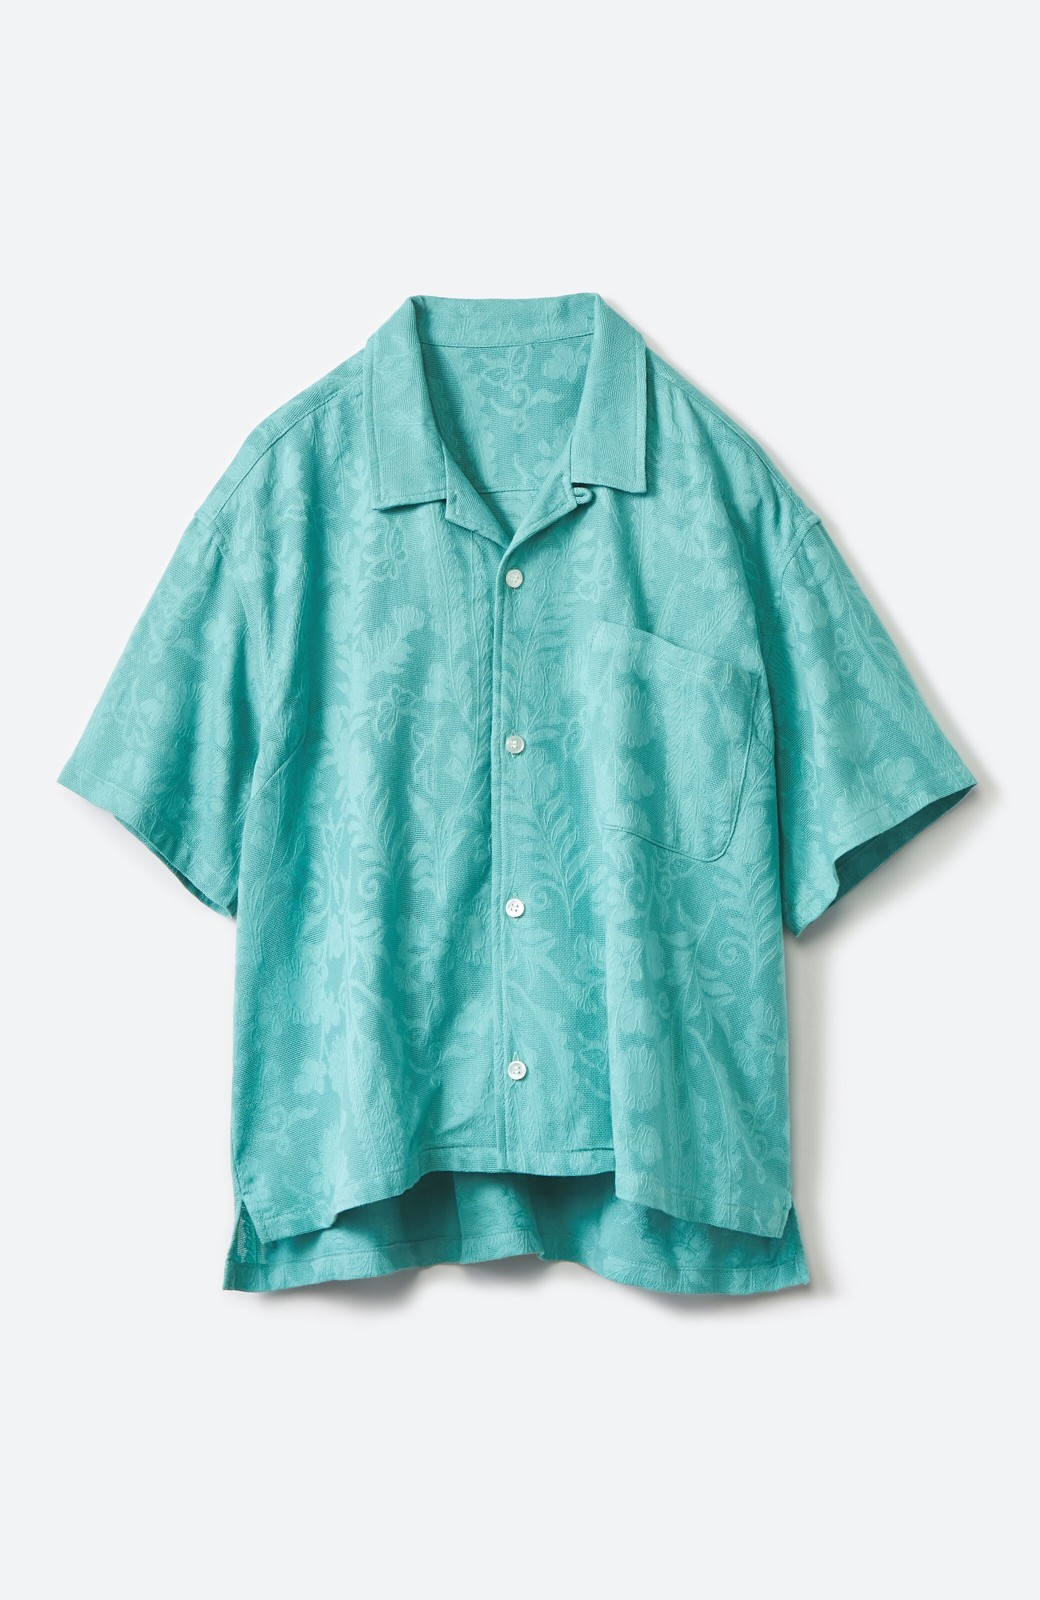 haco! 【今年も再販!】京都の浴衣屋さんと作った浴衣生地のシャツ <グリーン>の商品写真21